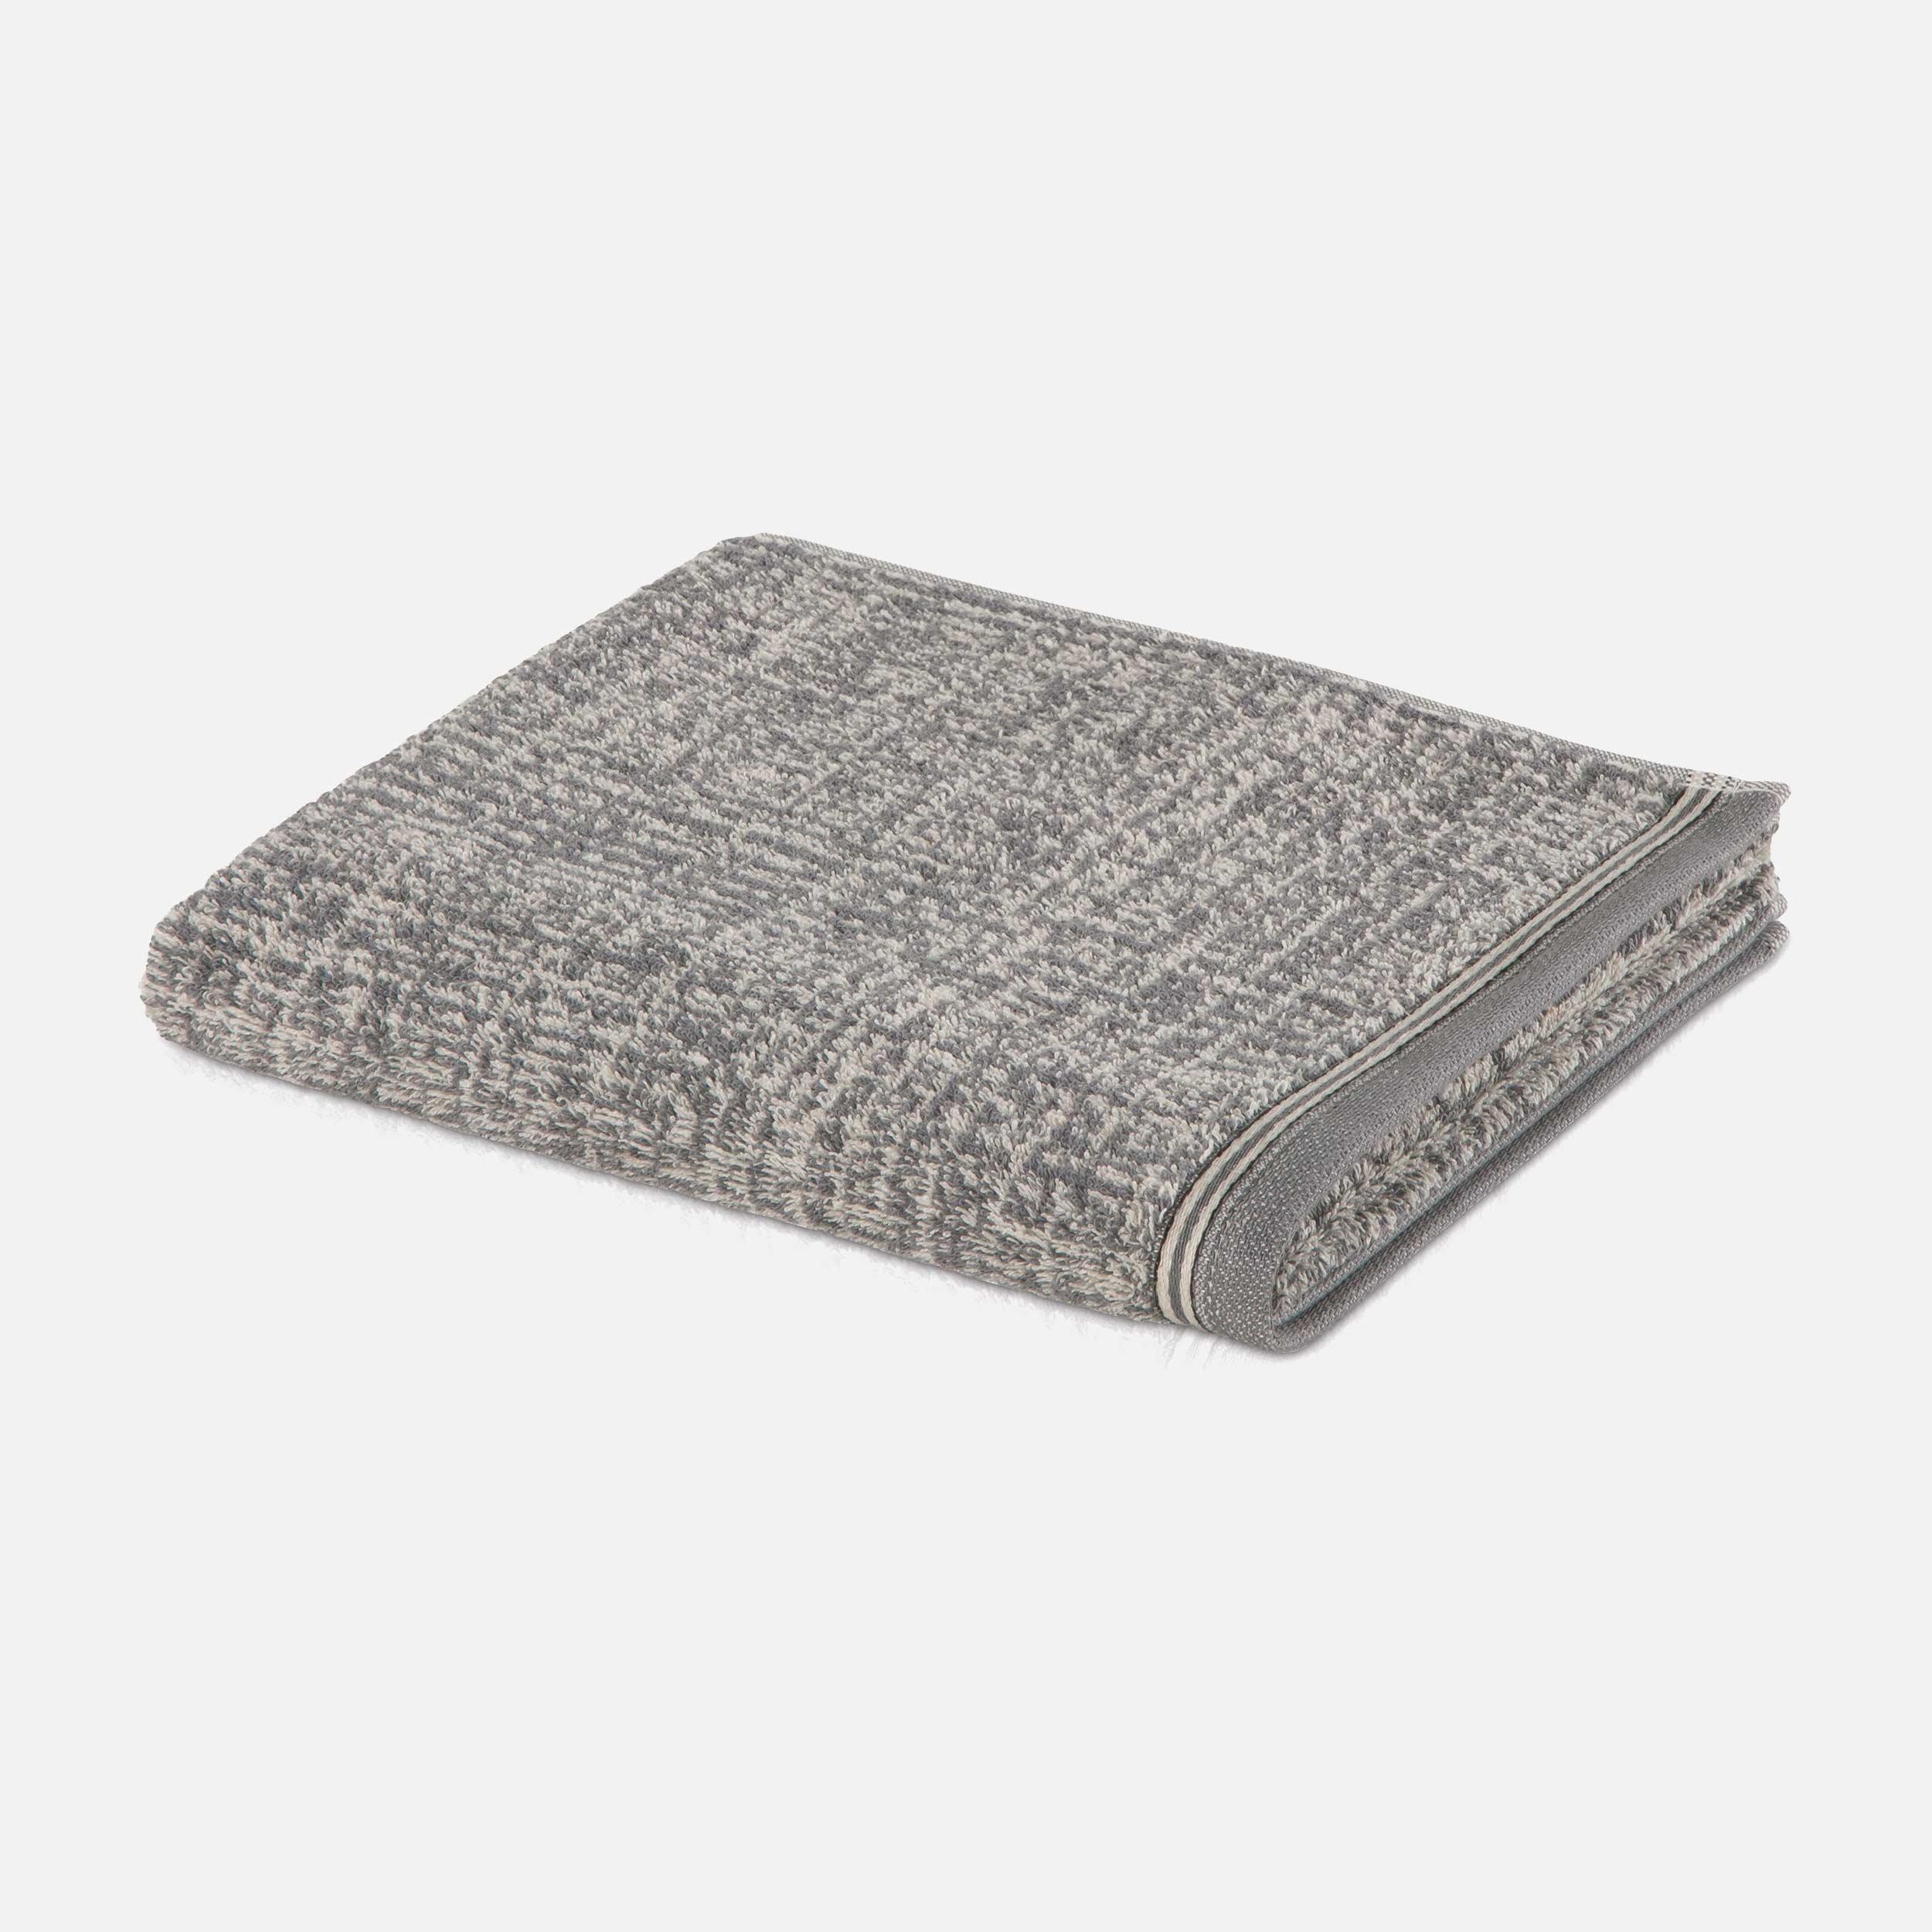 Duschtuch 80x150cm,Boheme Grey-Natur